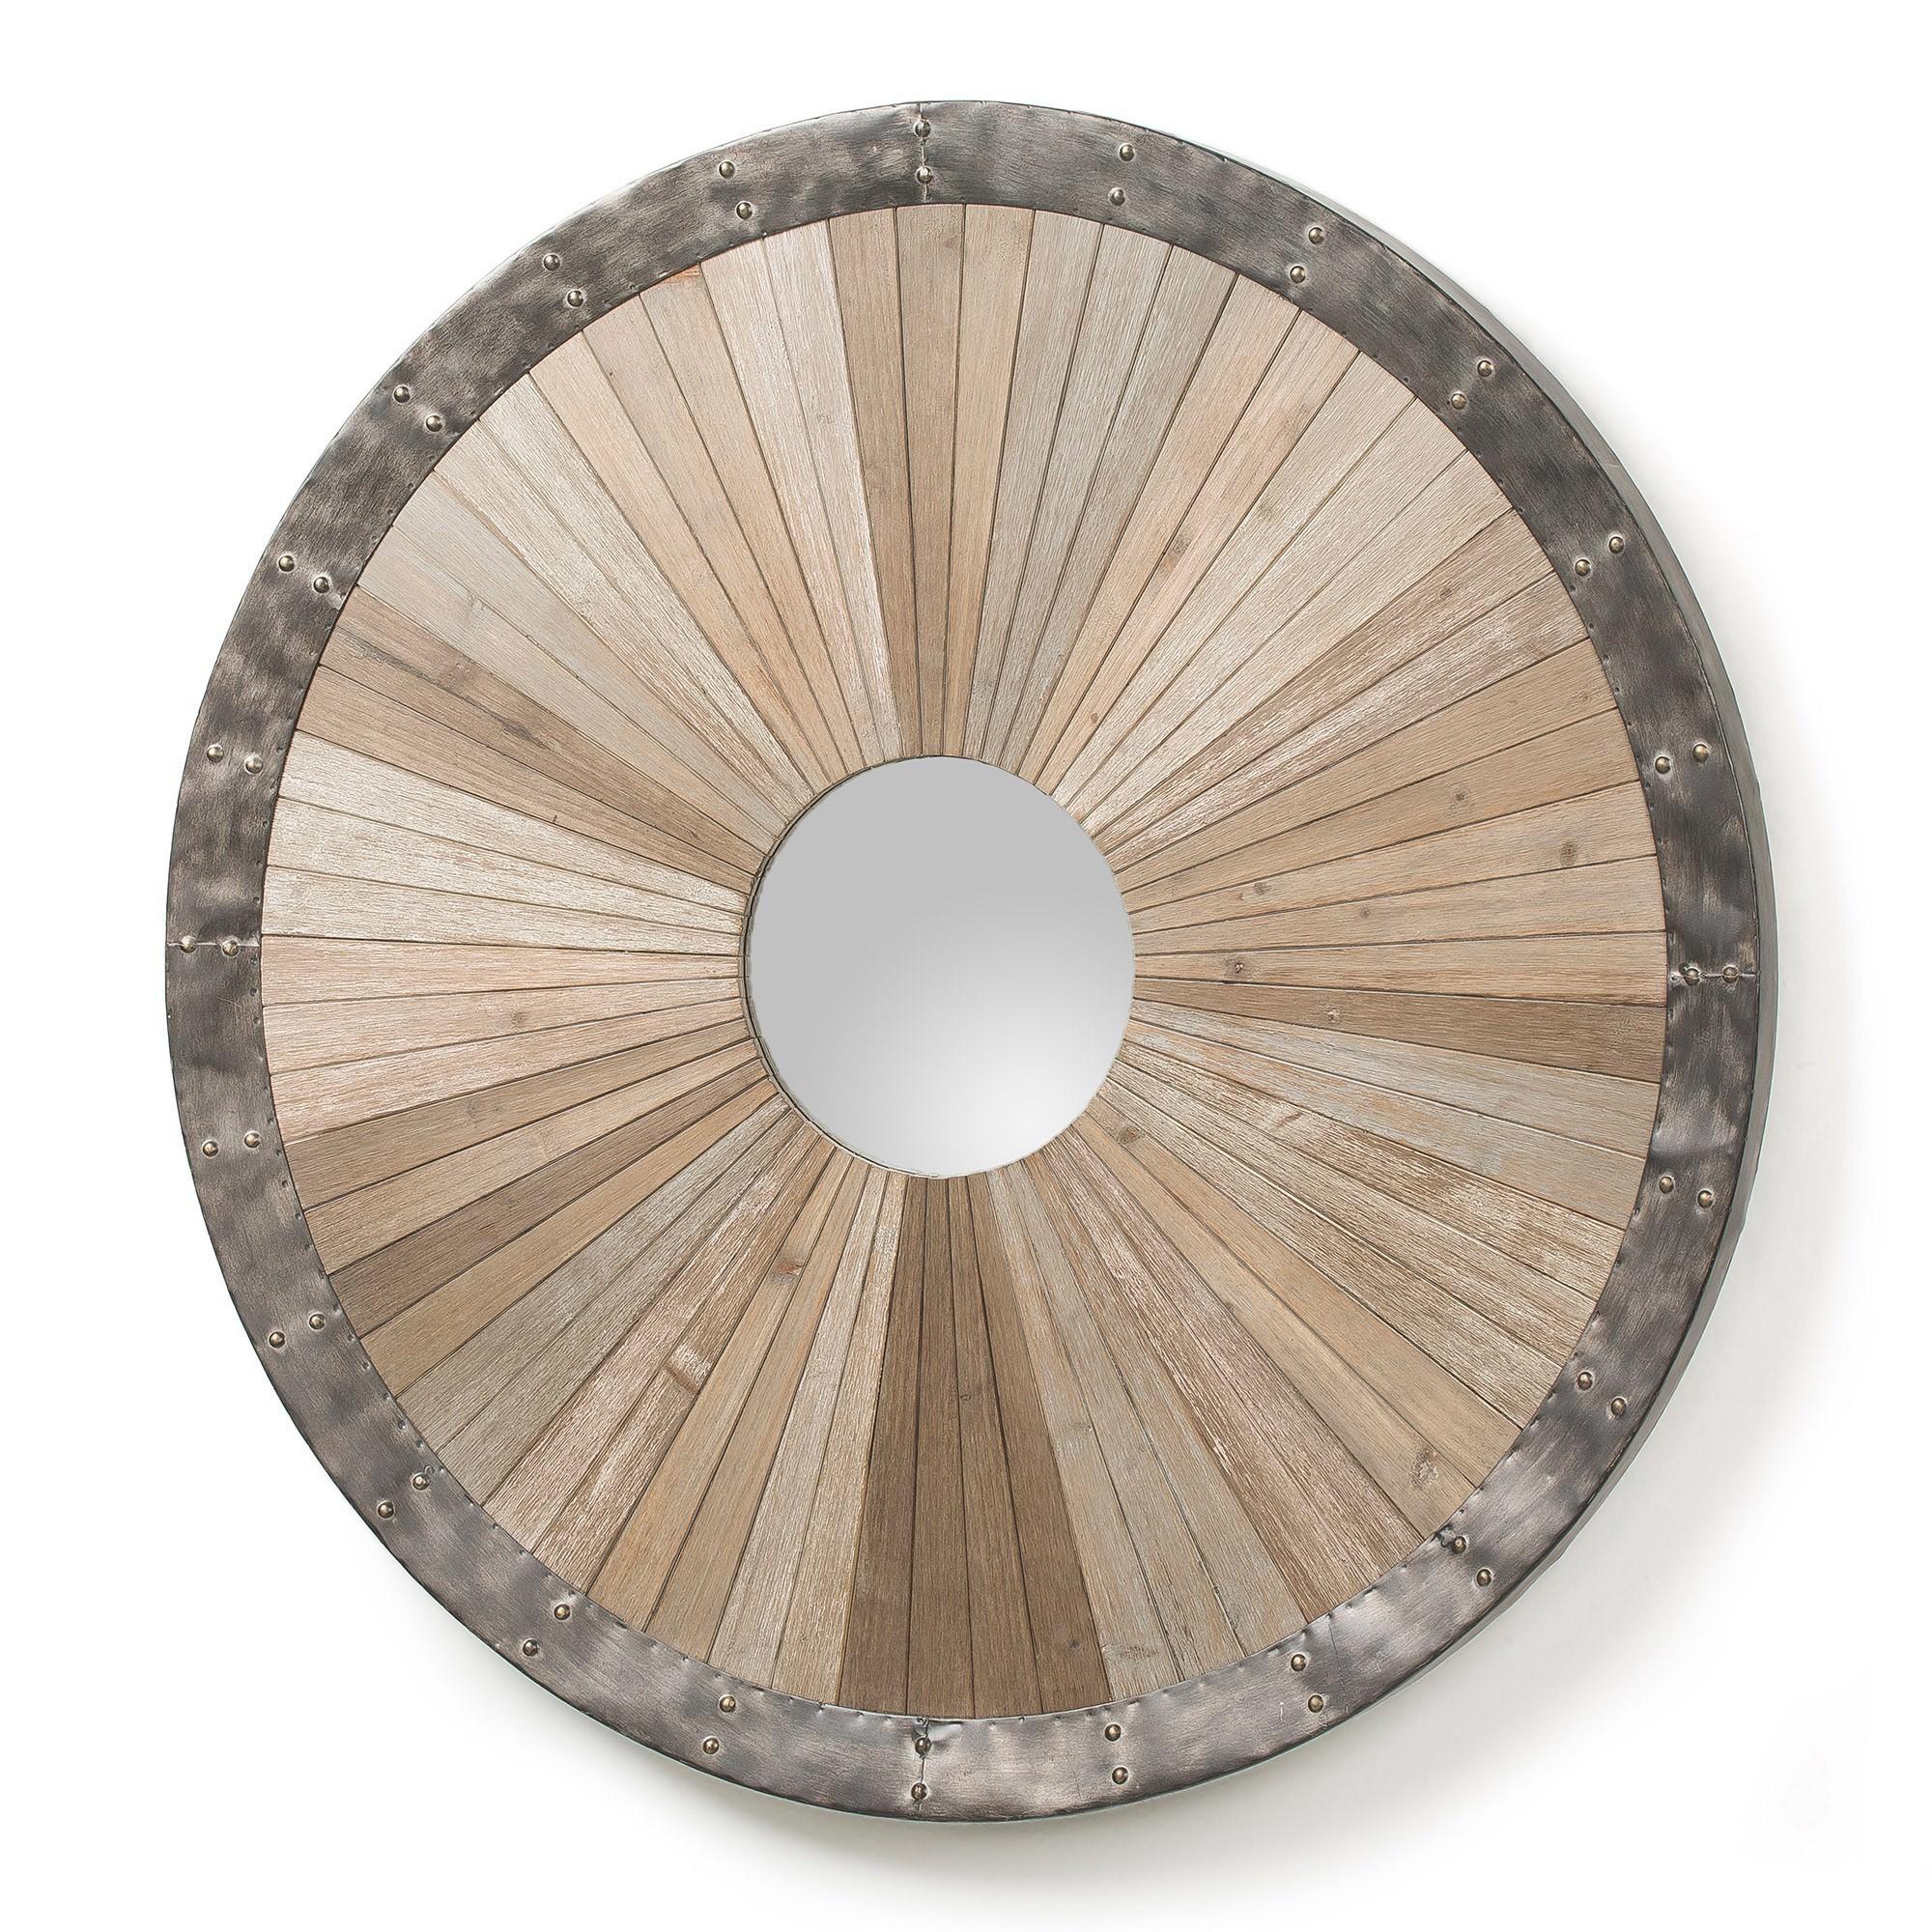 Rocco Fir Timber & Steel Frame Round Wall Mirror, 100cm